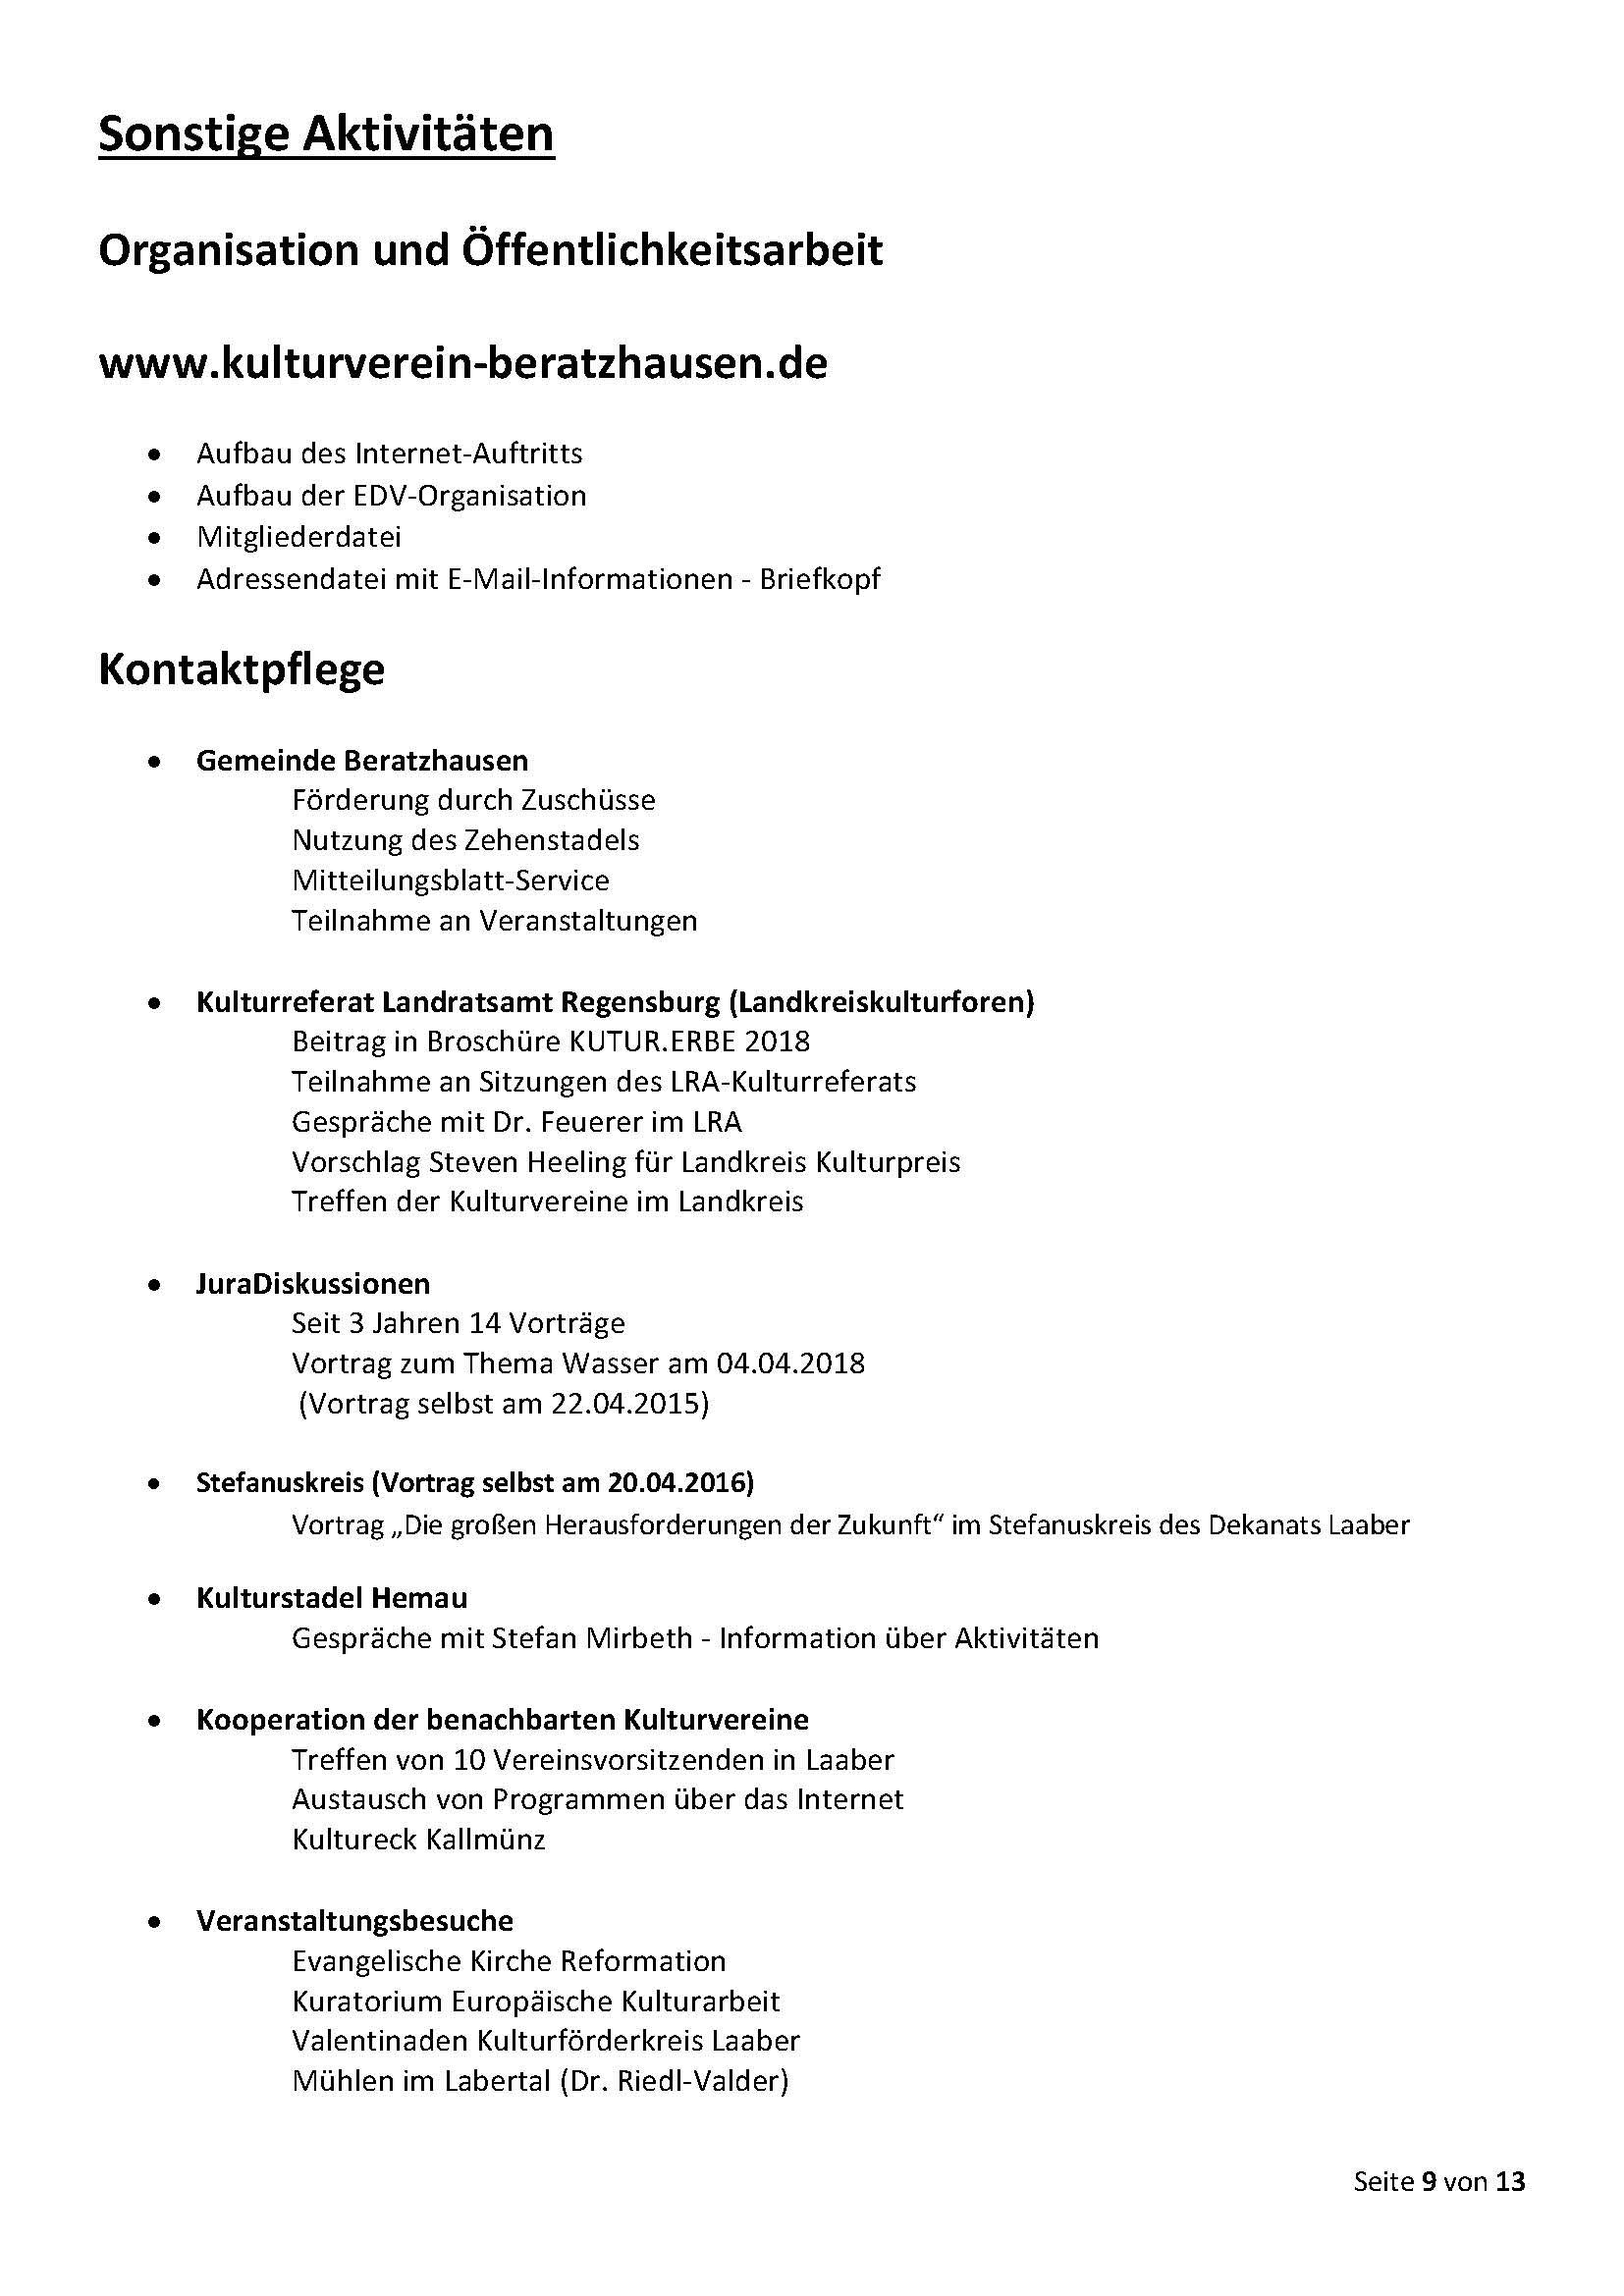 Enchanting Eventplanung Vorschlag Inspiration - FORTSETZUNG ...